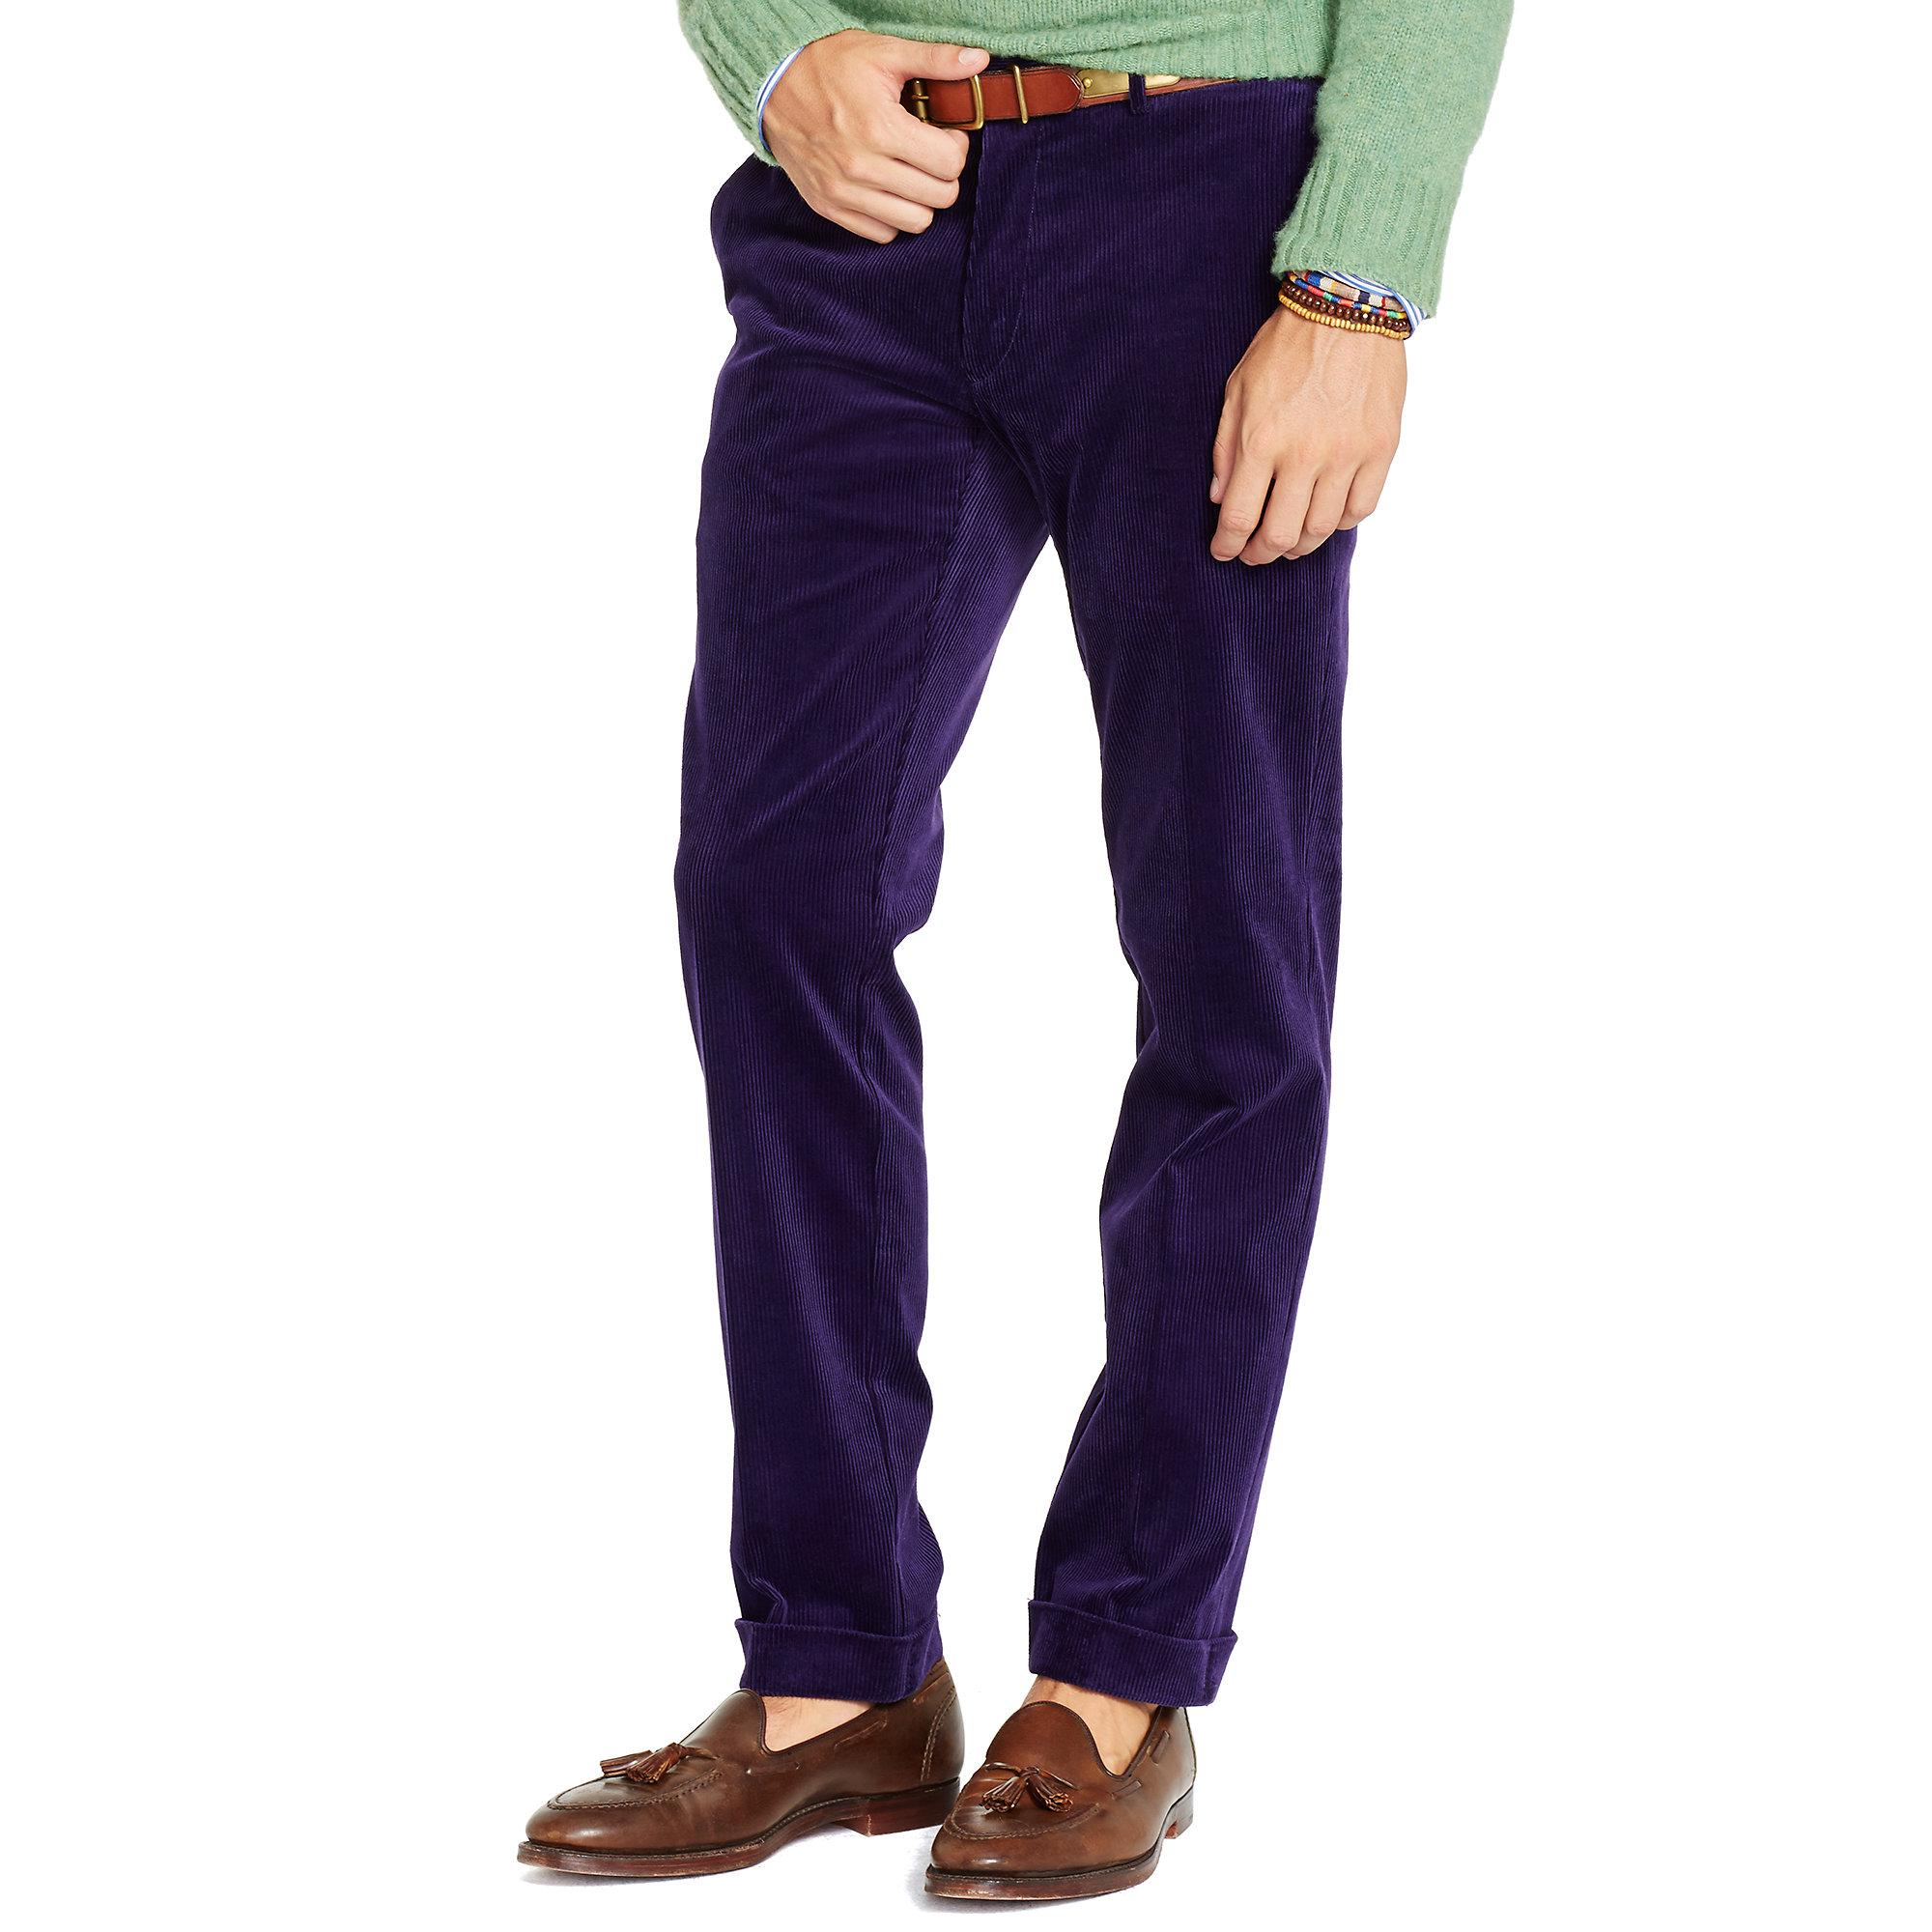 623e6103aa20cb Polo Ralph Lauren Slim-Fit Hudson Pant in Blue for Men - Lyst